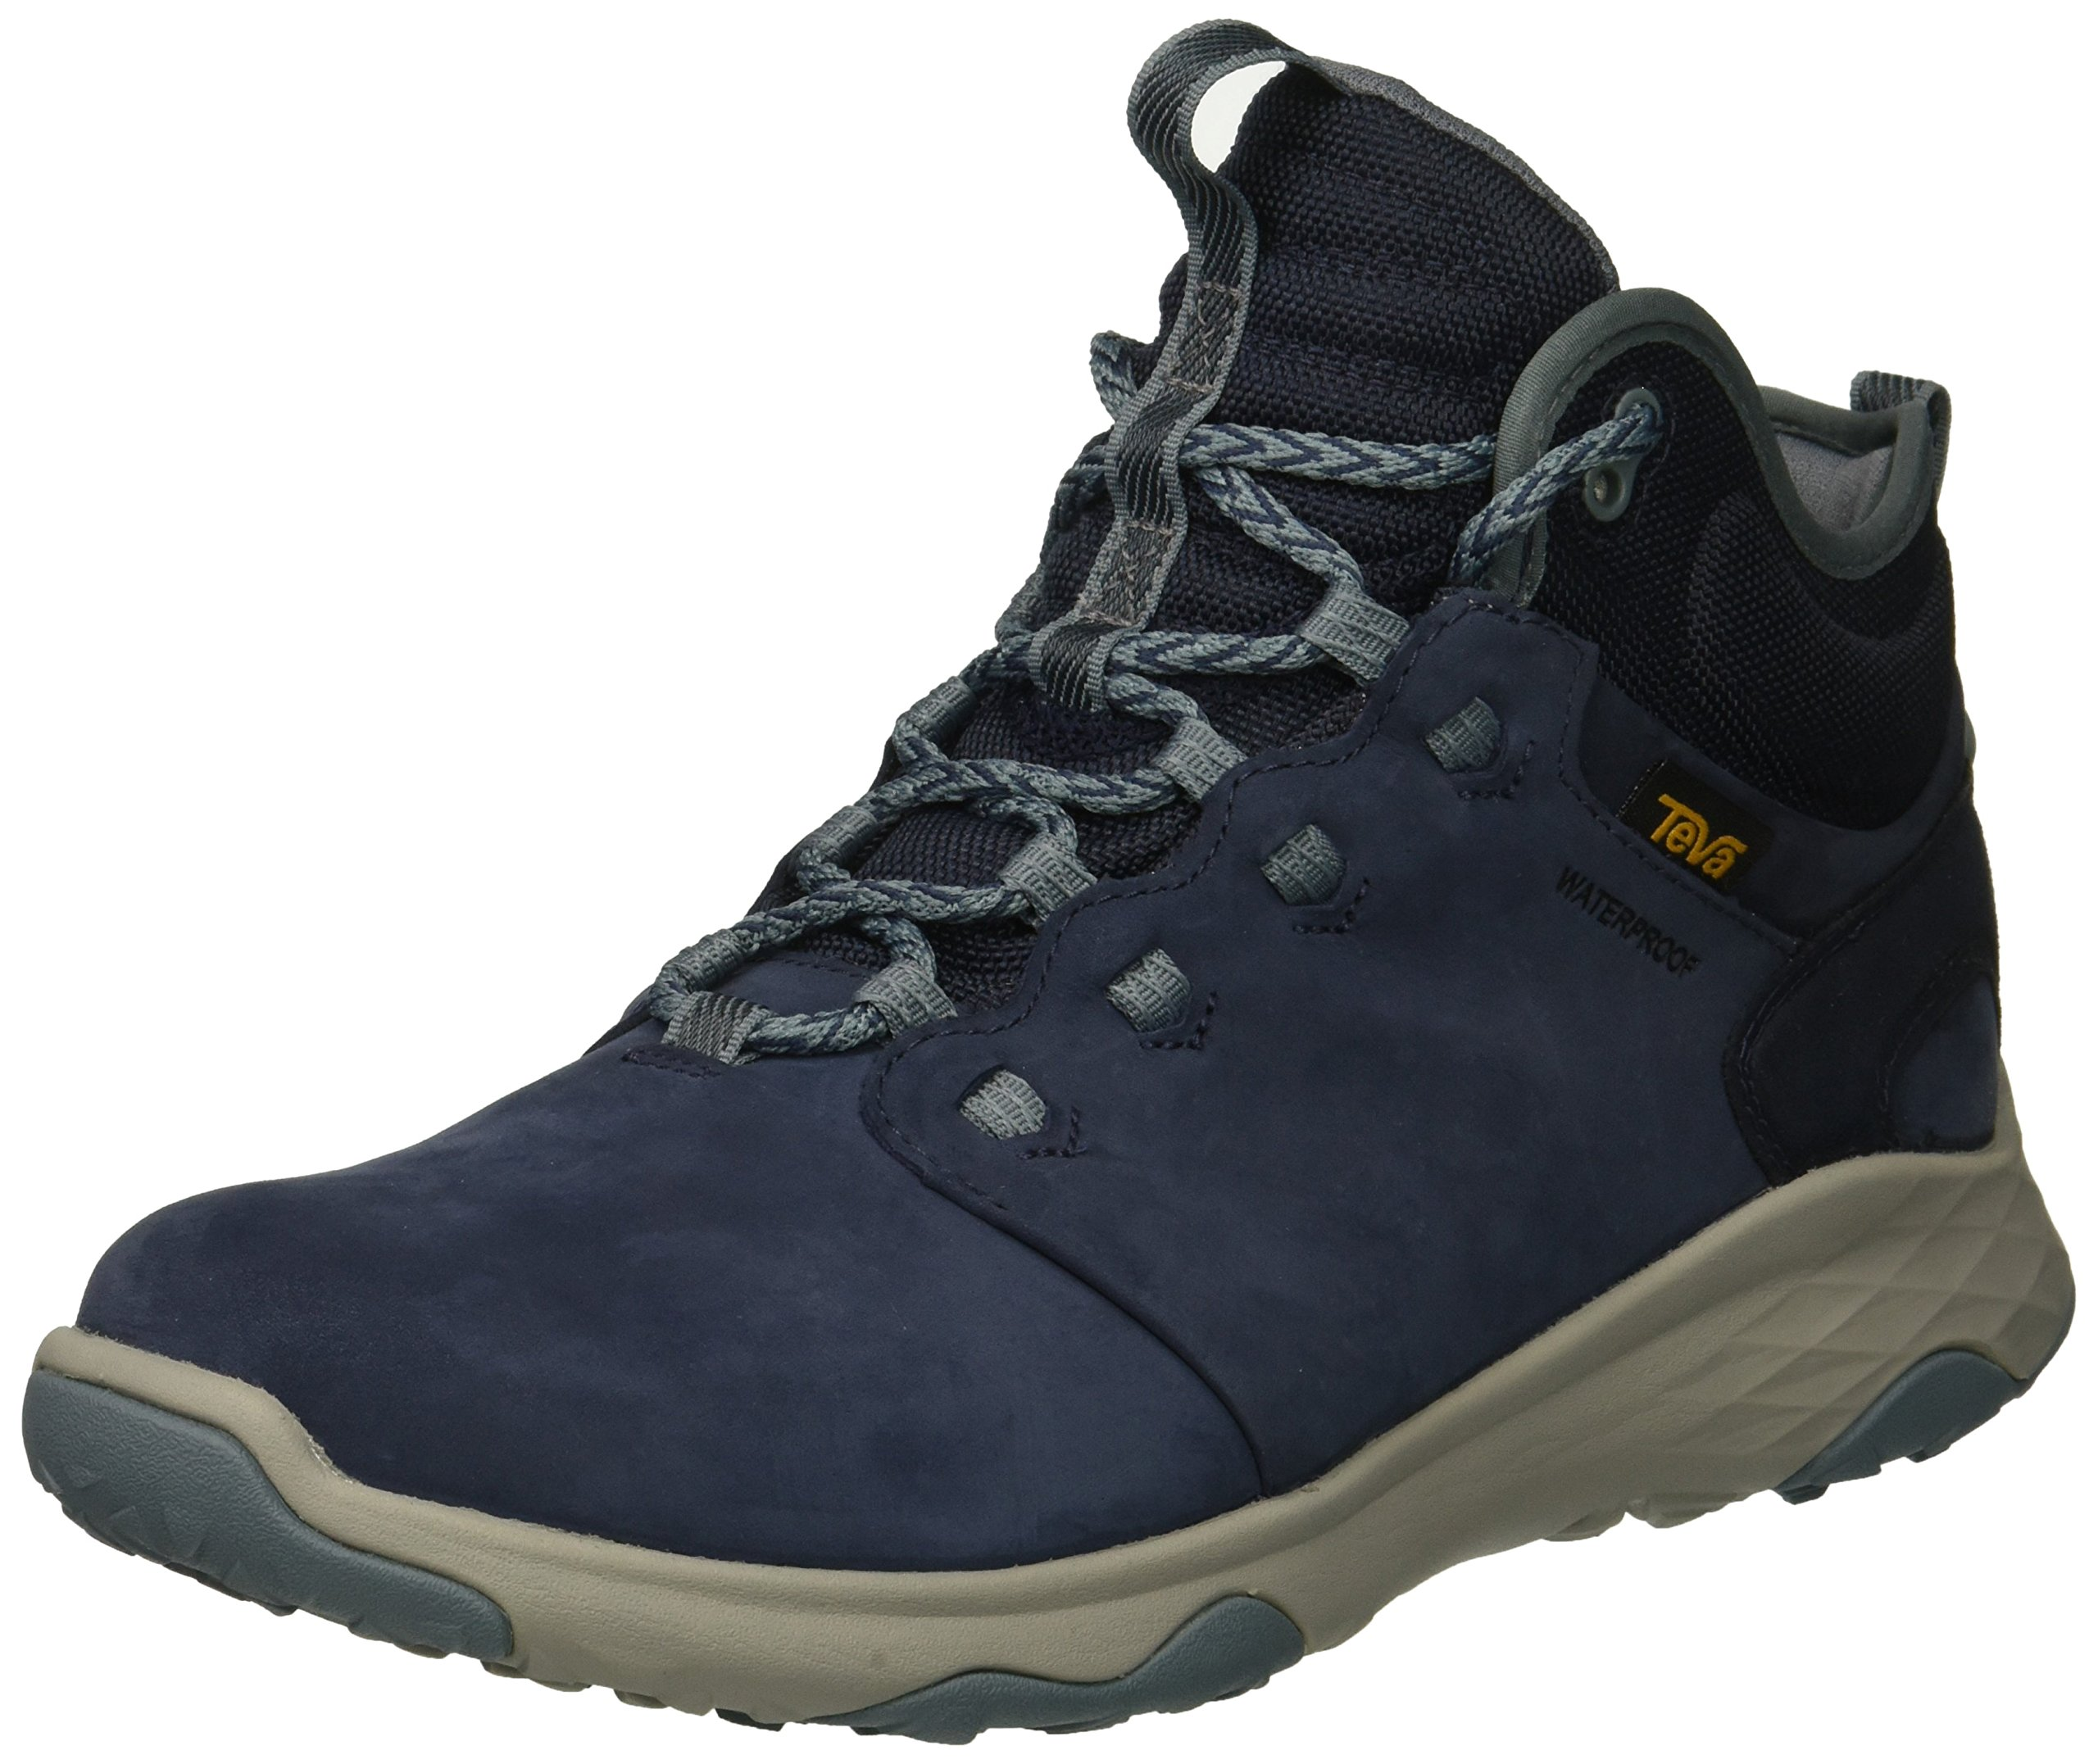 Teva Women's W Arrowood 2 Mid Waterproof Hiking Boot, Midnight Navy, 08 M US by Teva